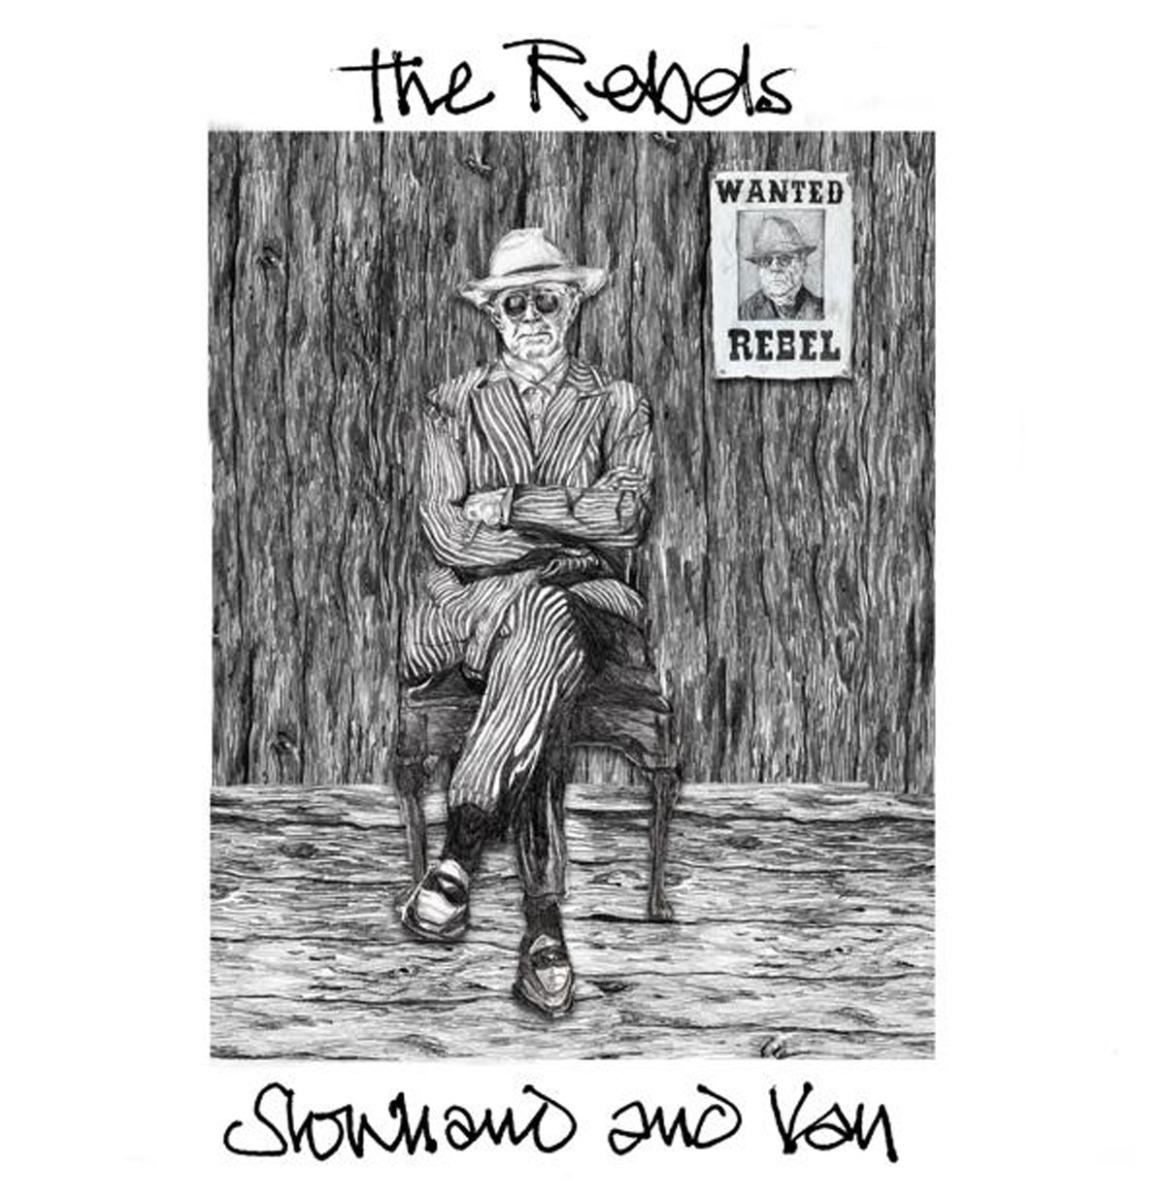 "Slowhand & Van (Eric Clapton & Van Morrison) - Rebels 12"" Vinyl"